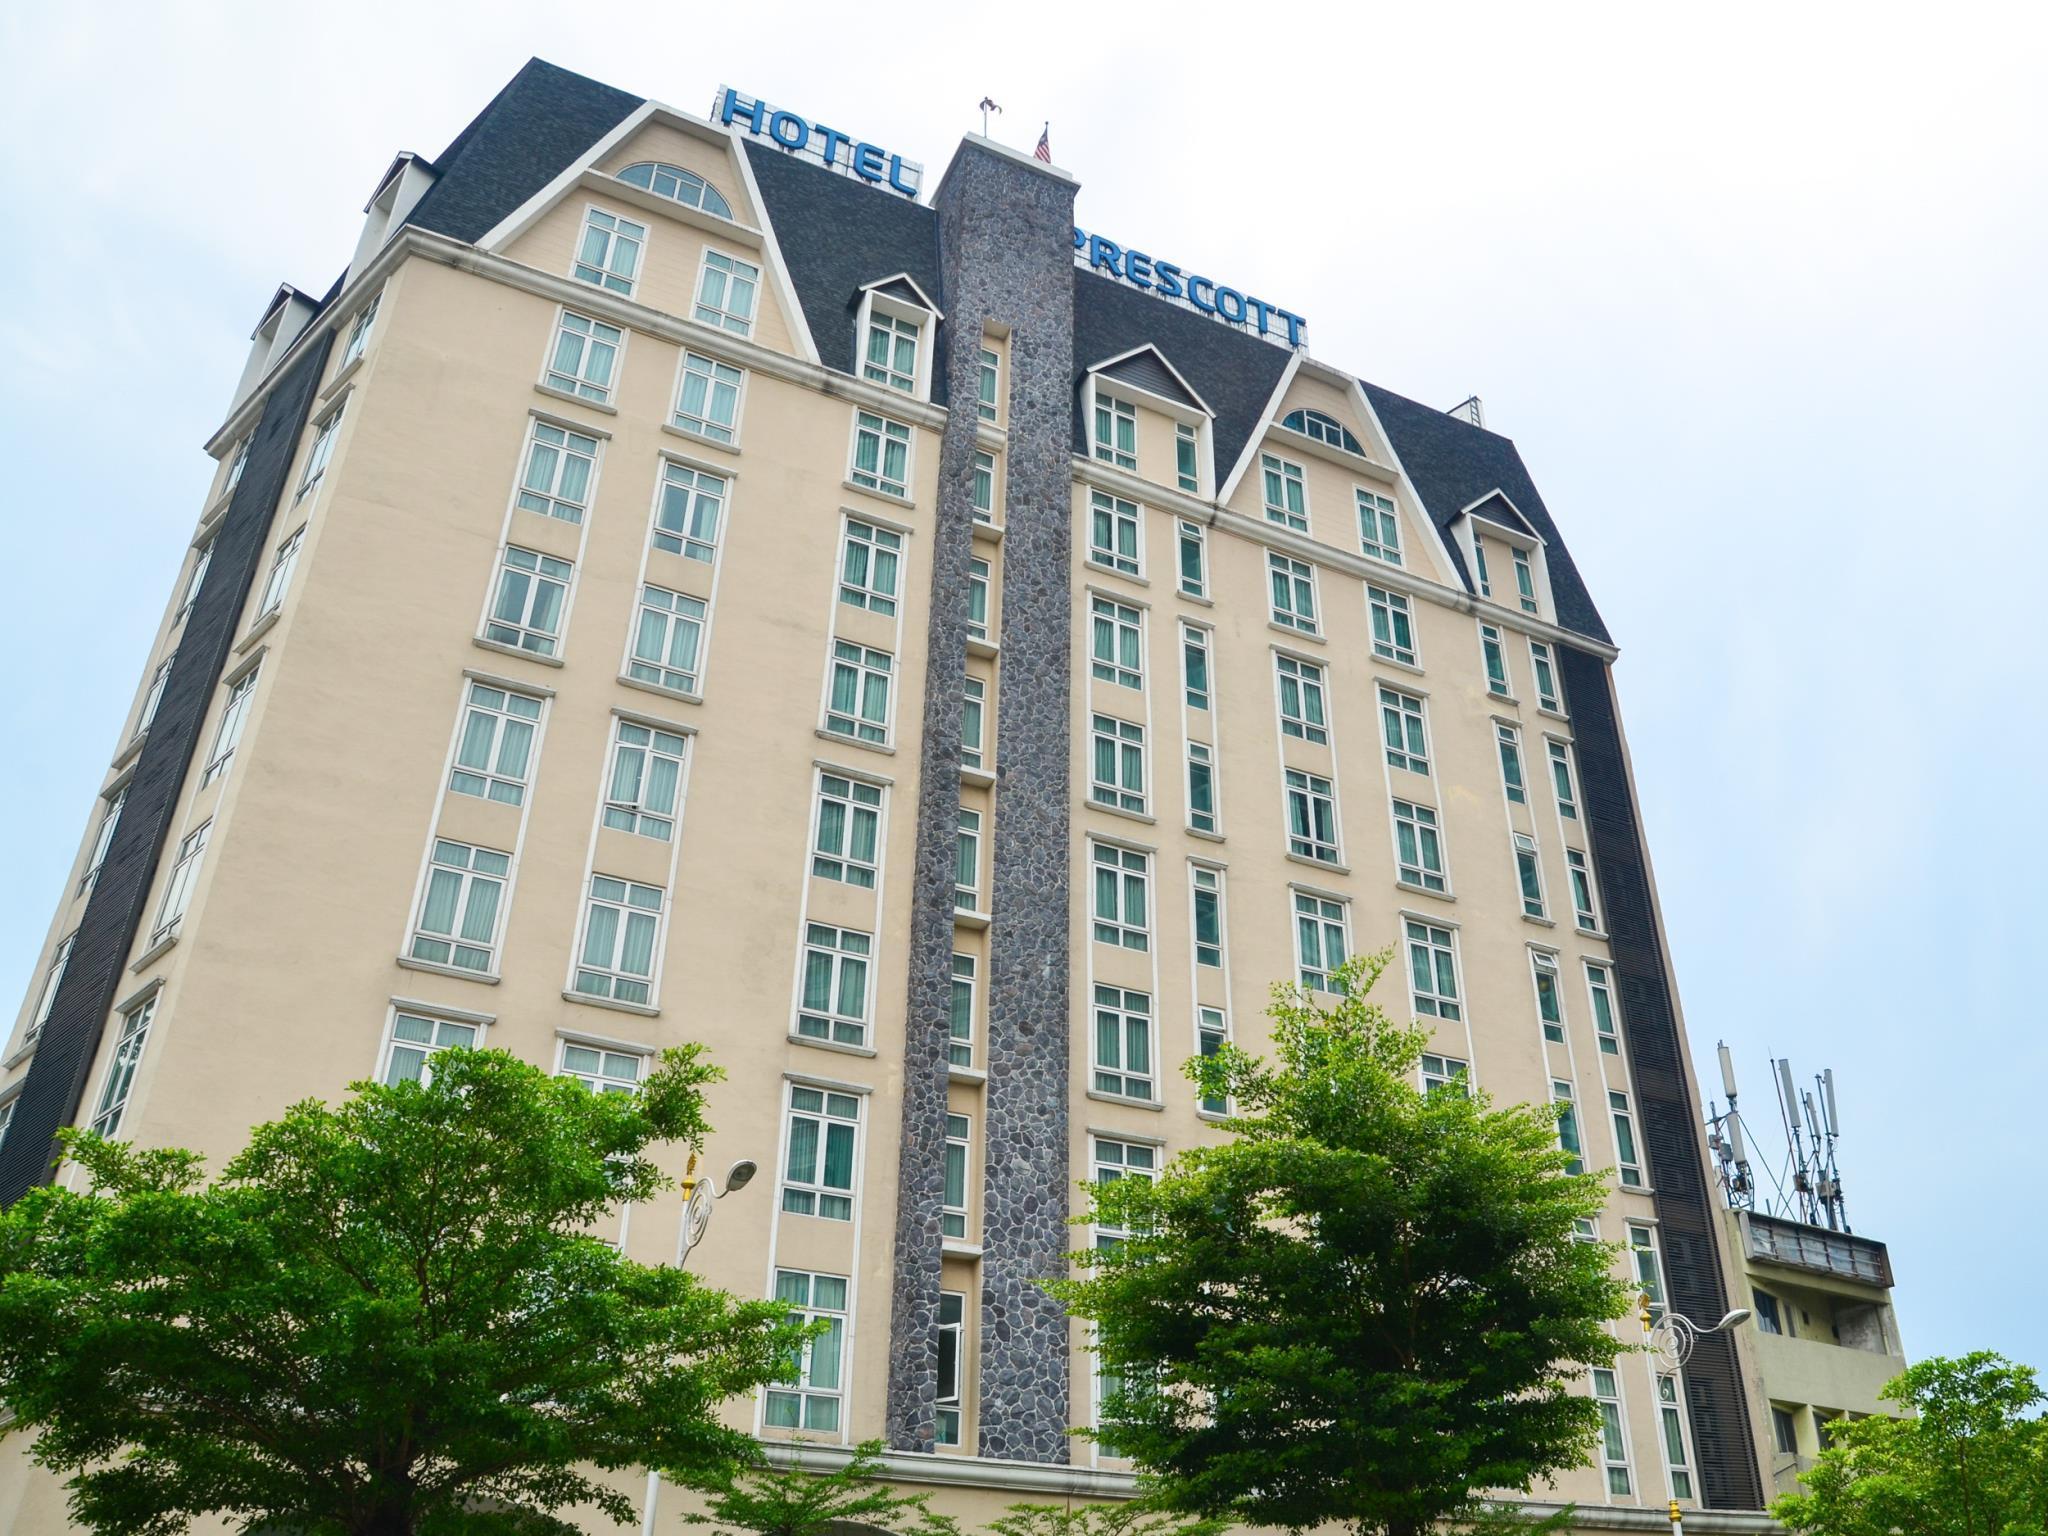 Prescott Hotel KL Sentral